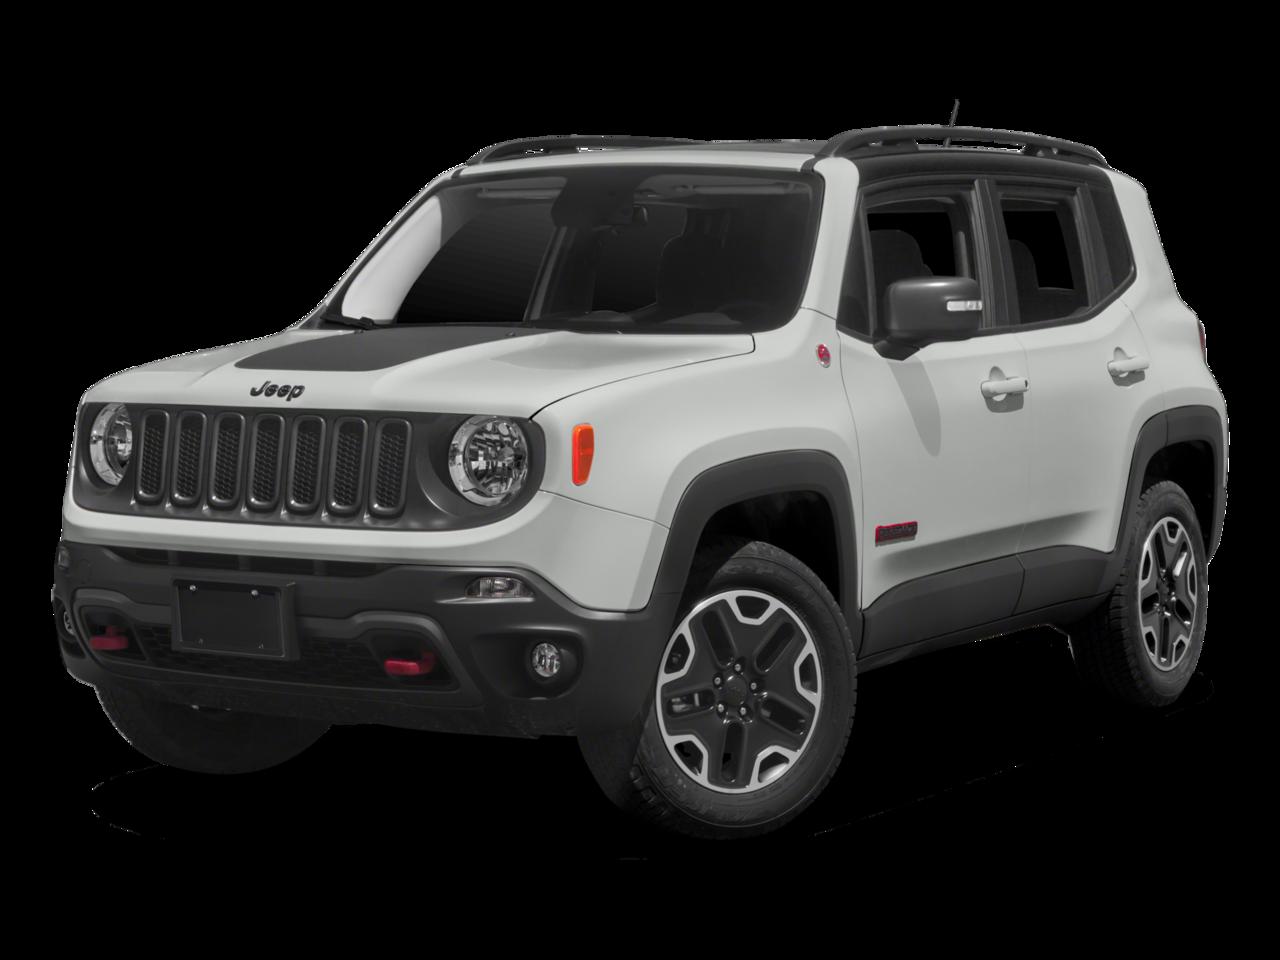 2017 Jeep Renegade Trailhawk Sport Utility